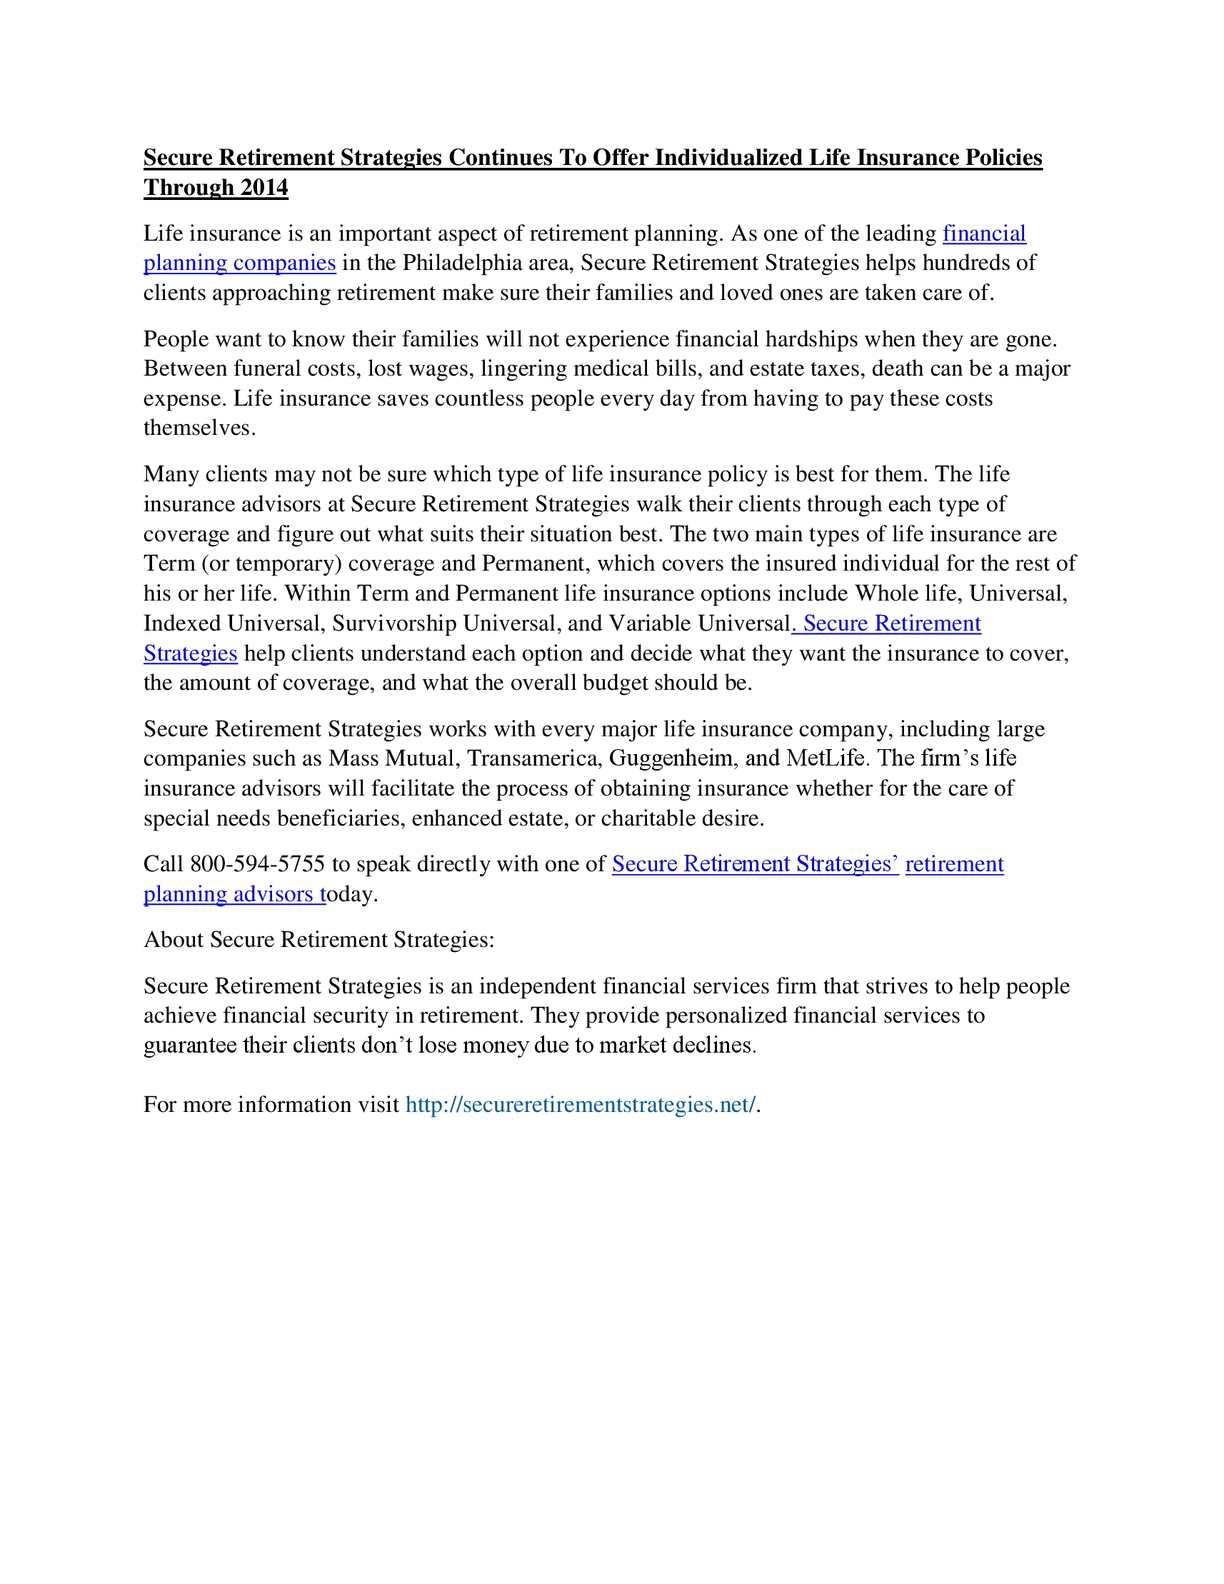 Top Ten Life Insurance Companies >> Calameo Retirement Planning Advisors